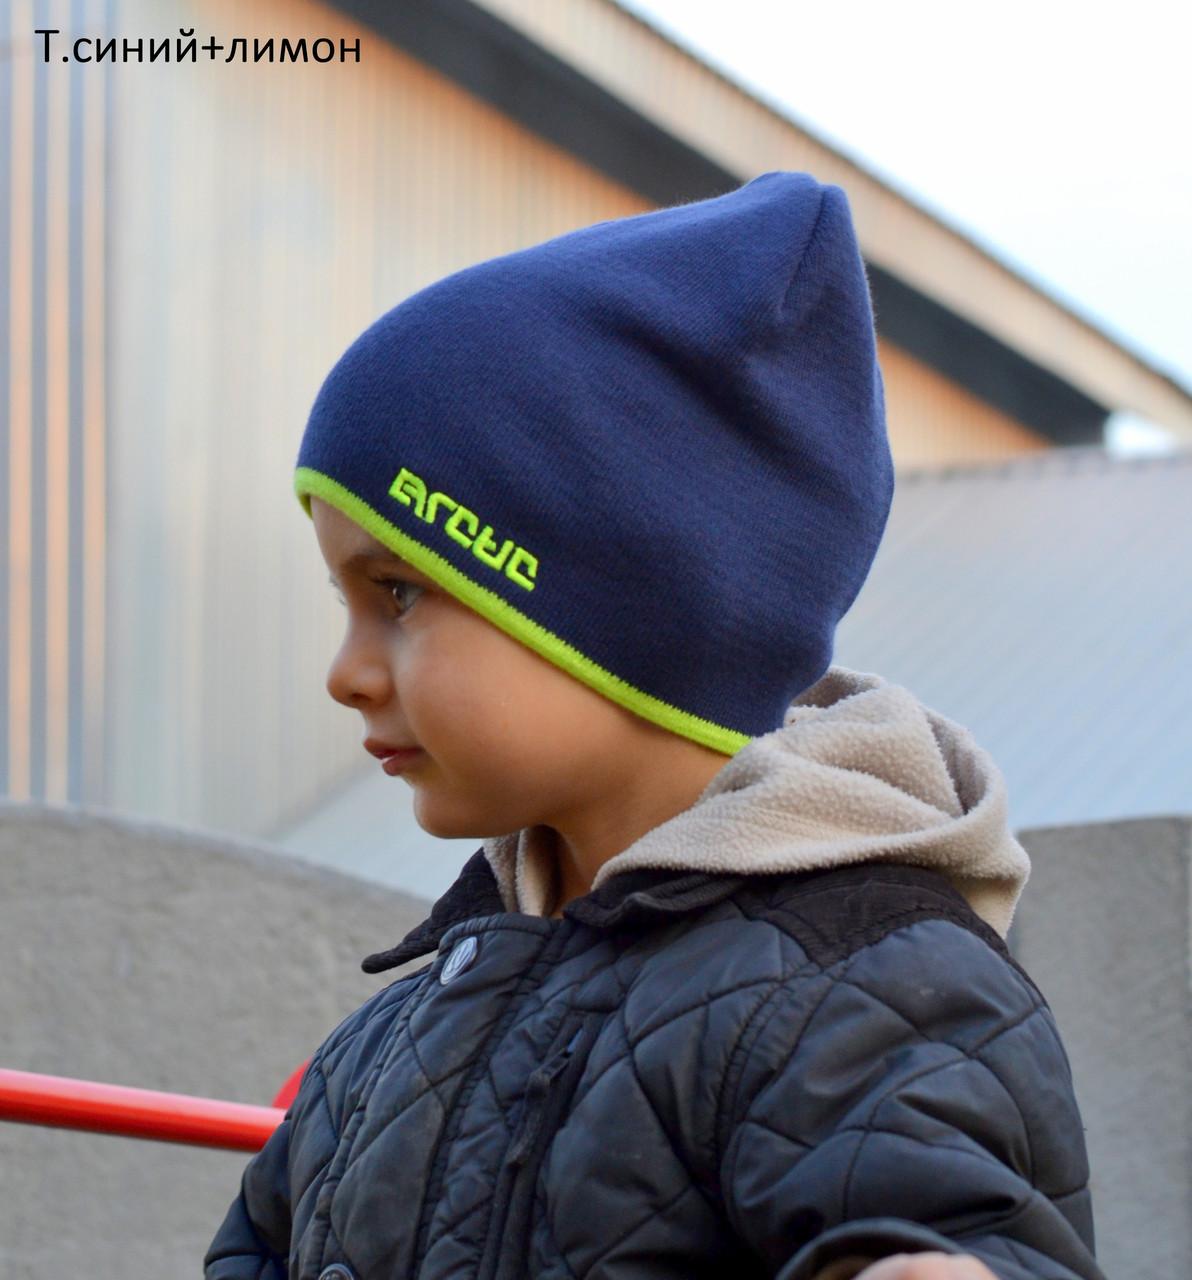 Авангард. Двойная шапка, х/б. 2-5 лет (р.48-52) Т.роз, т.син+лимон,электрик, т.сер+лимон, т.сер+сер,красный